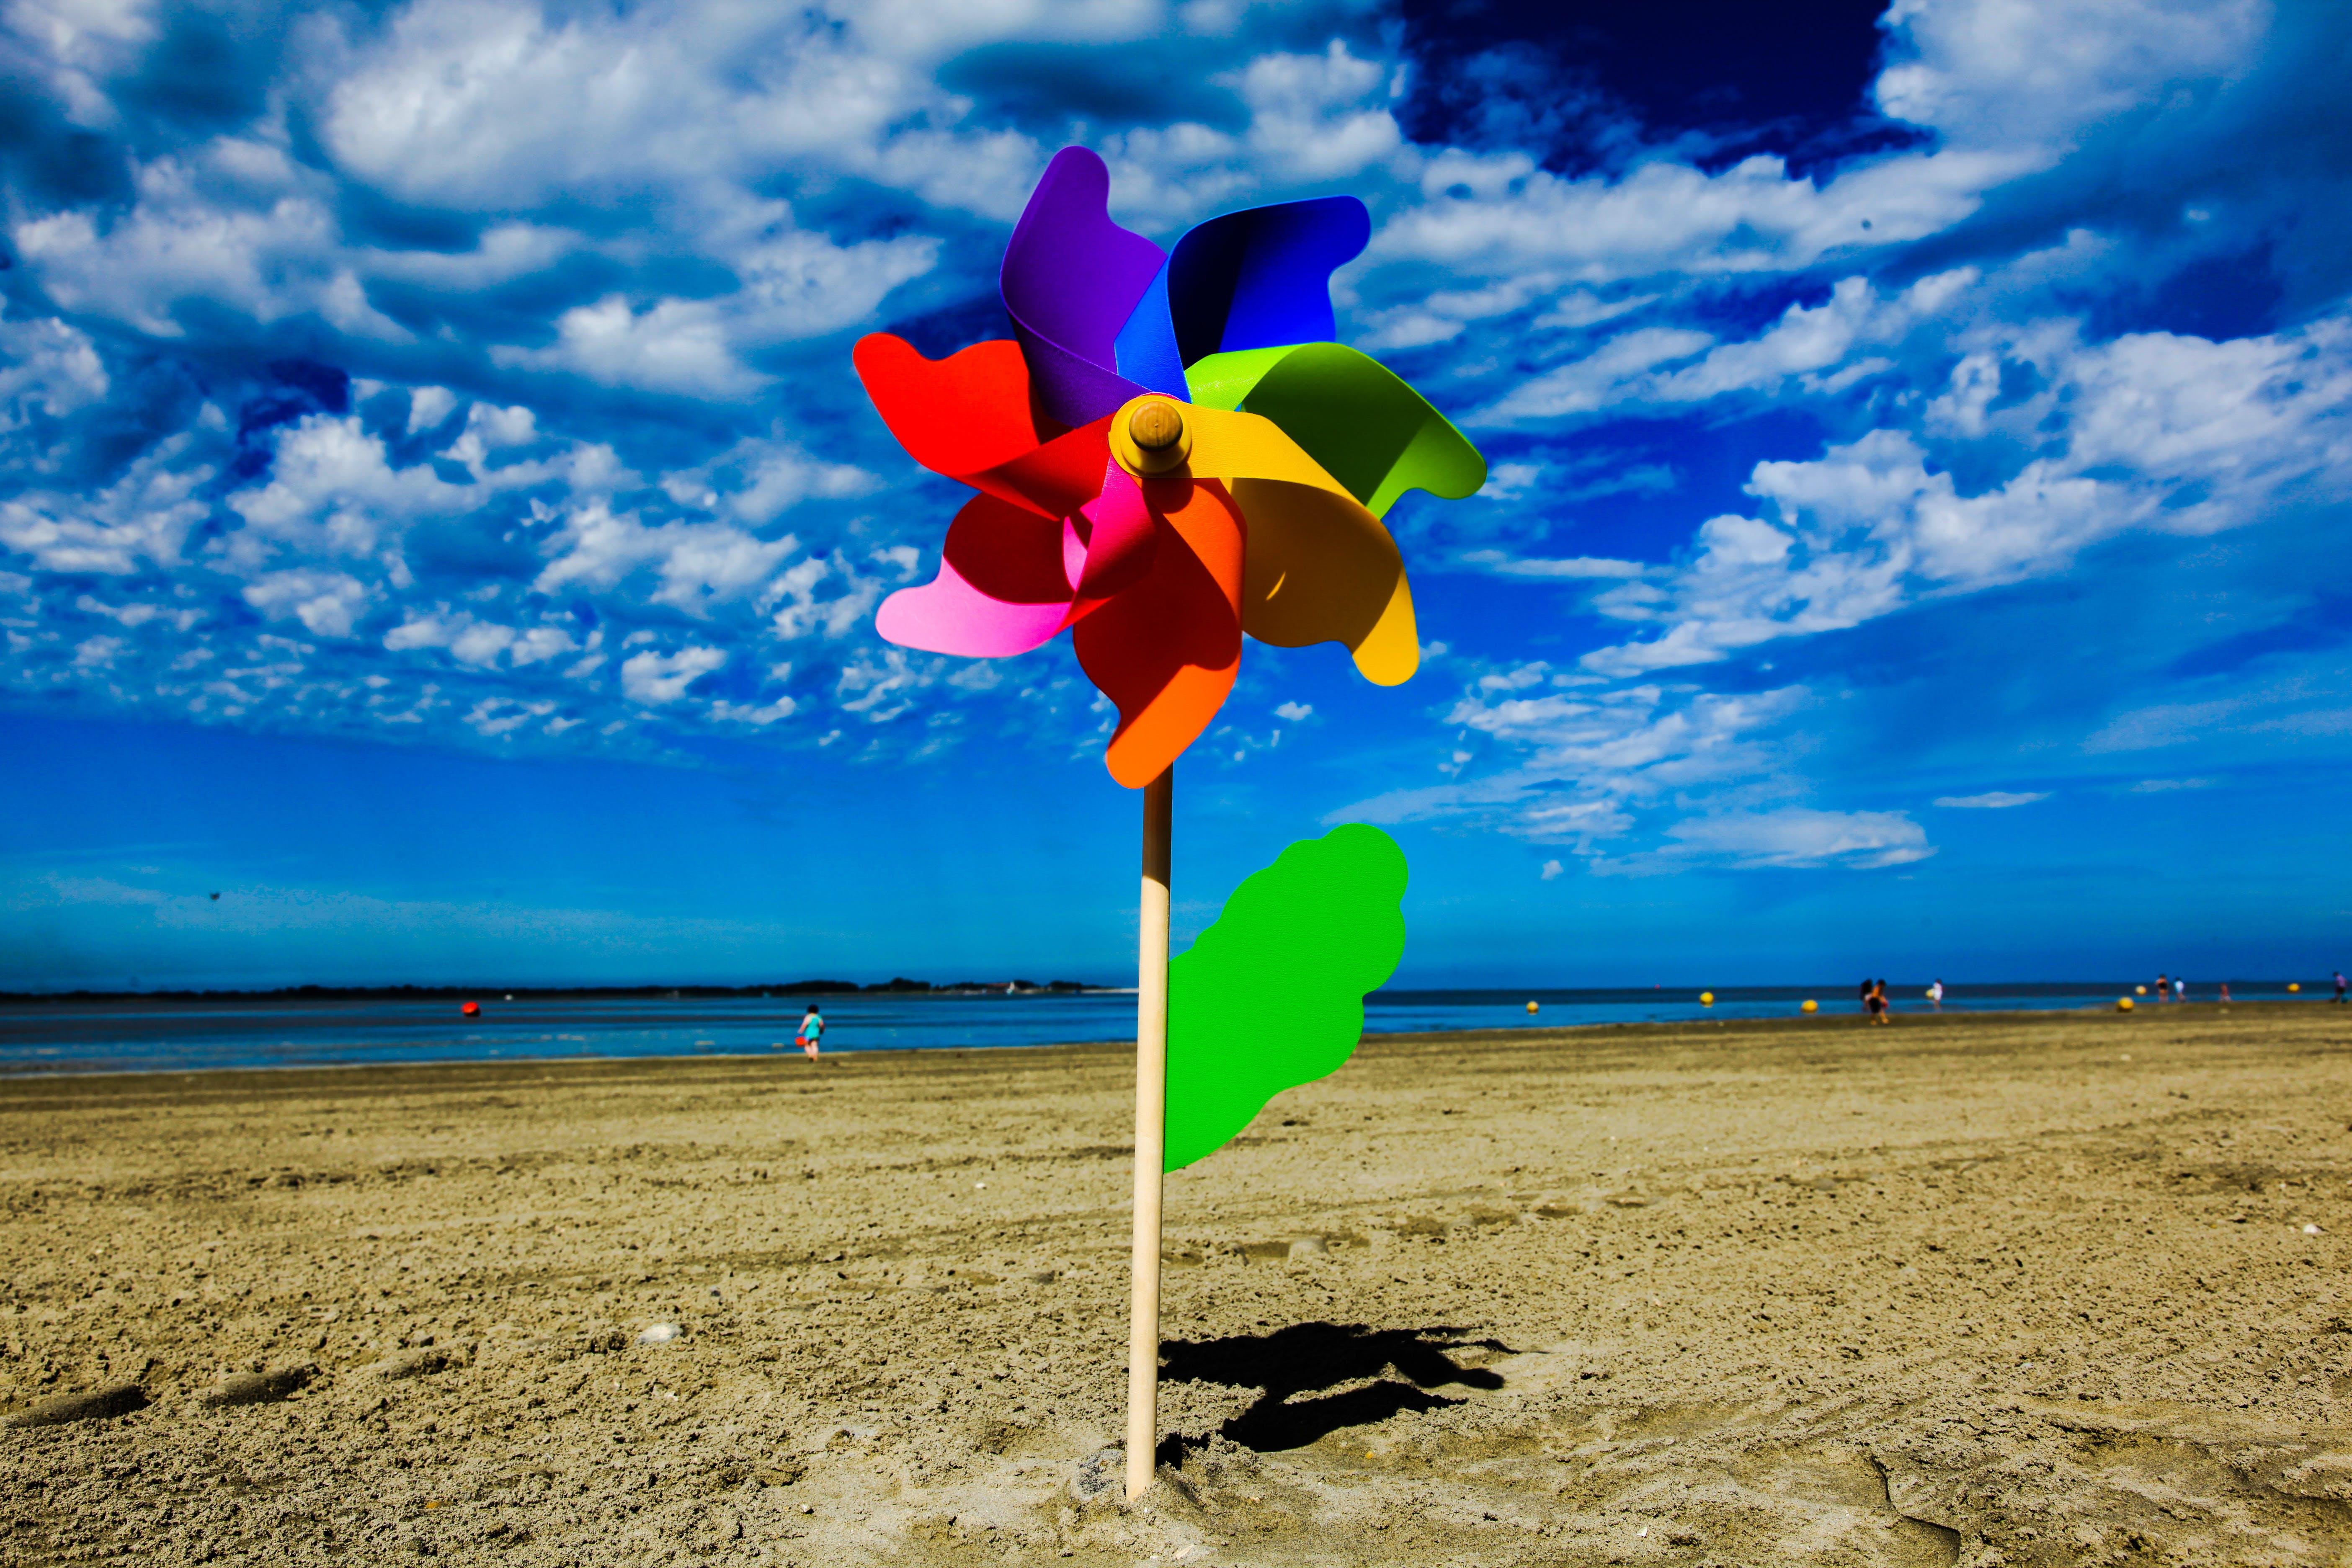 Free stock photo of beach, flower, sand, wind